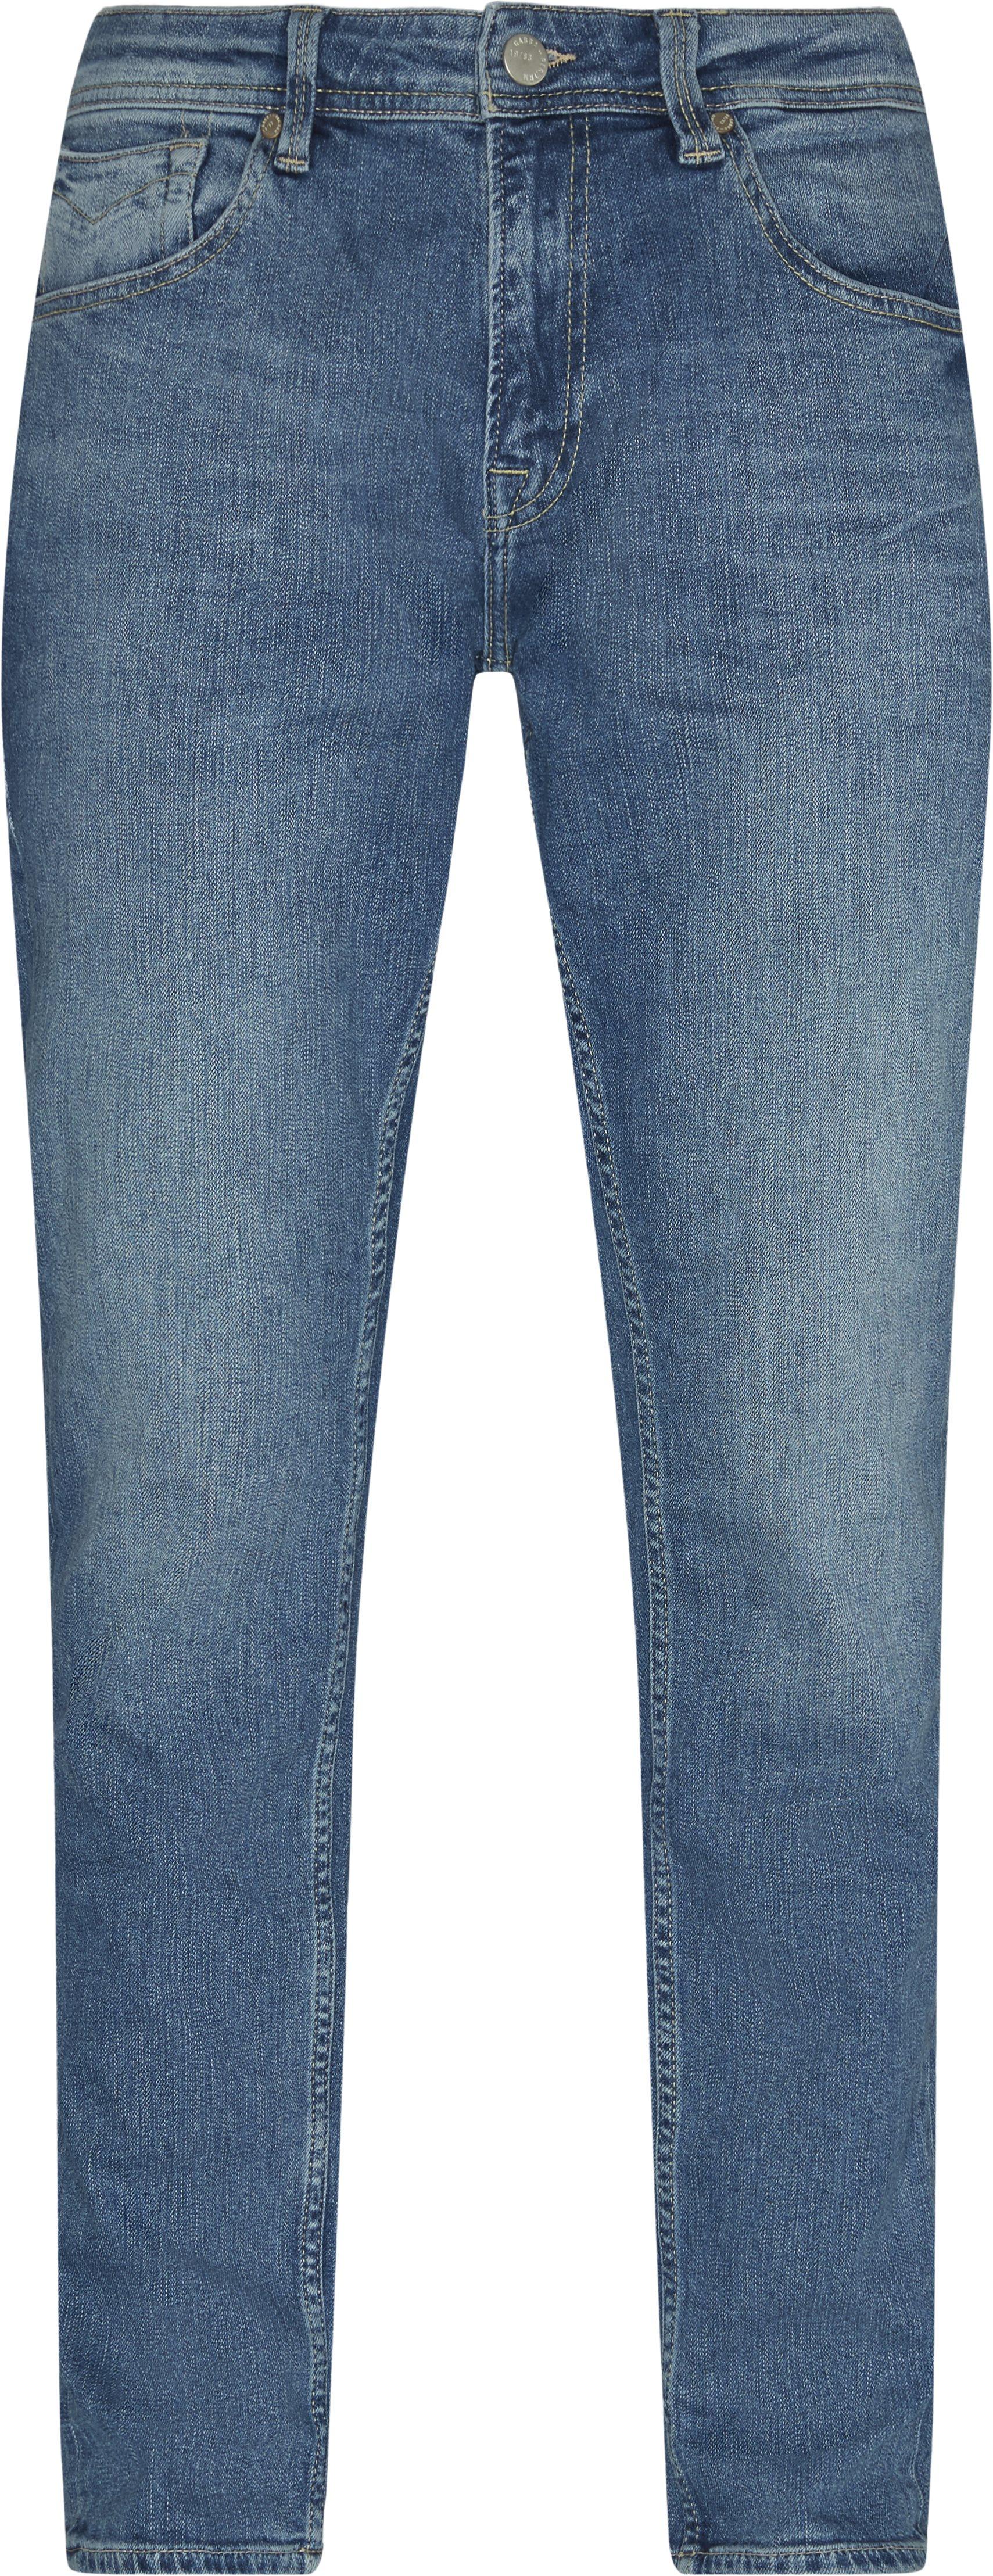 Nico K2614 Jeans - Jeans - Regular - Denim